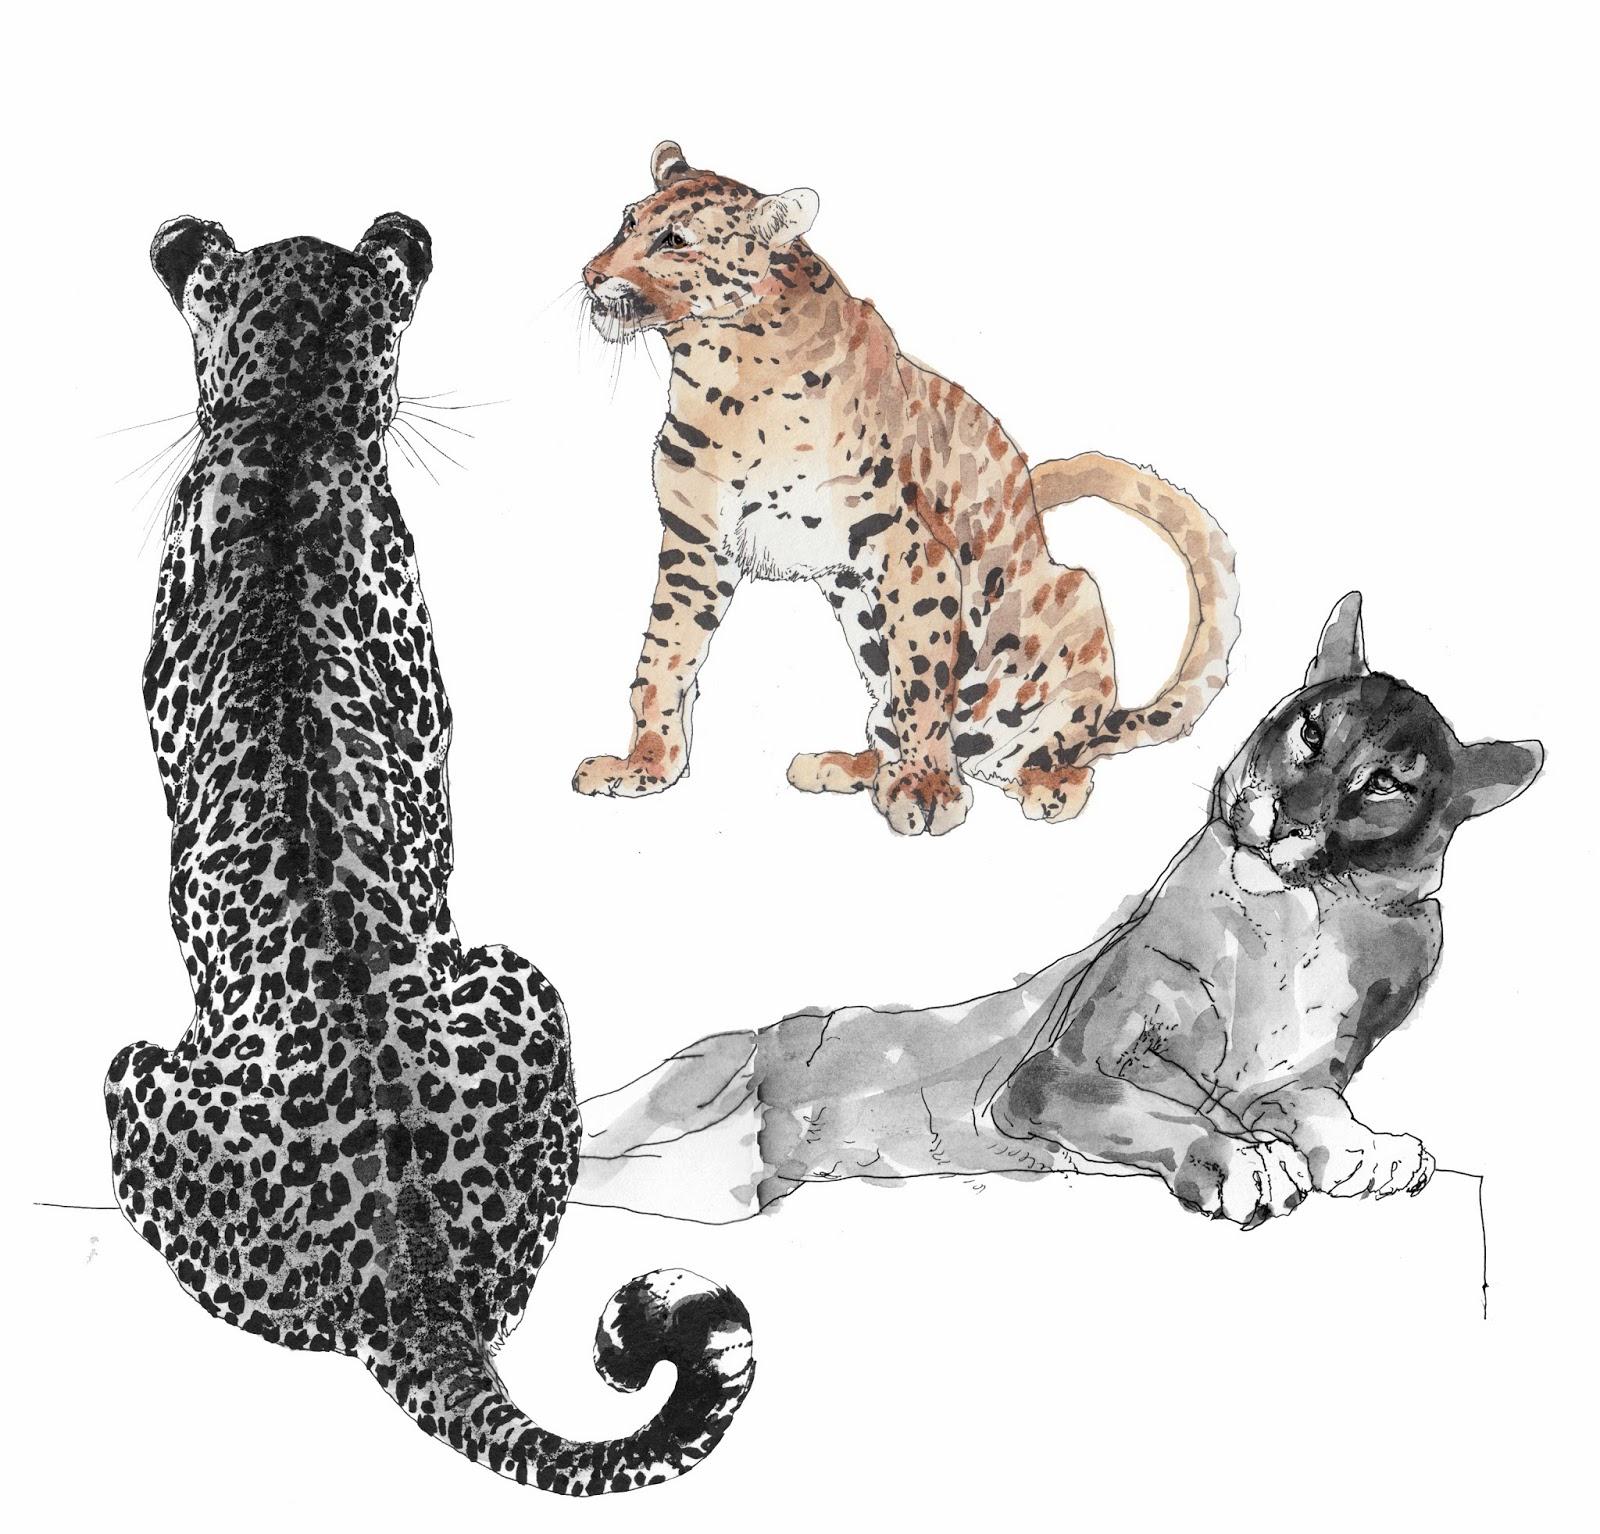 mutant leopards the messybeast - HD1600×1534